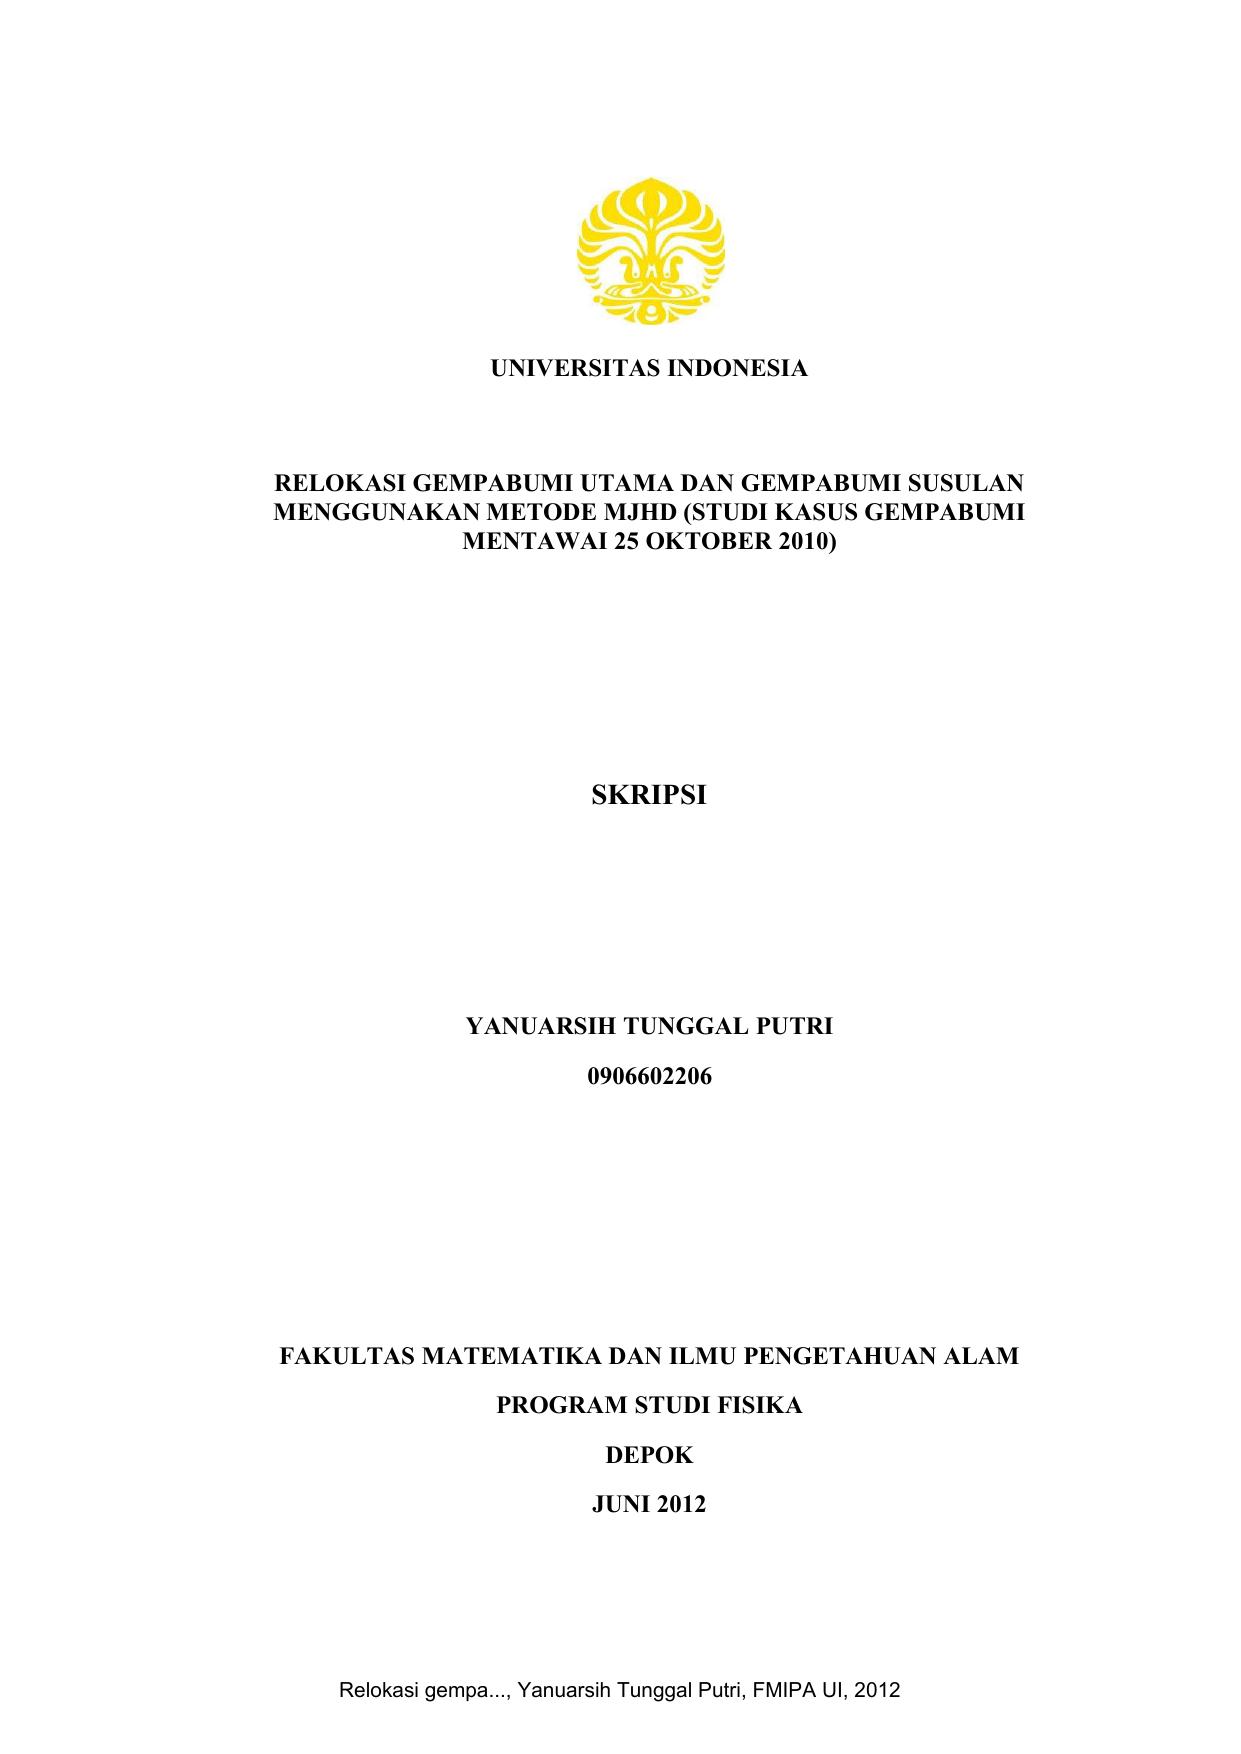 Skripsi Perpustakaan Universitas Indonesia